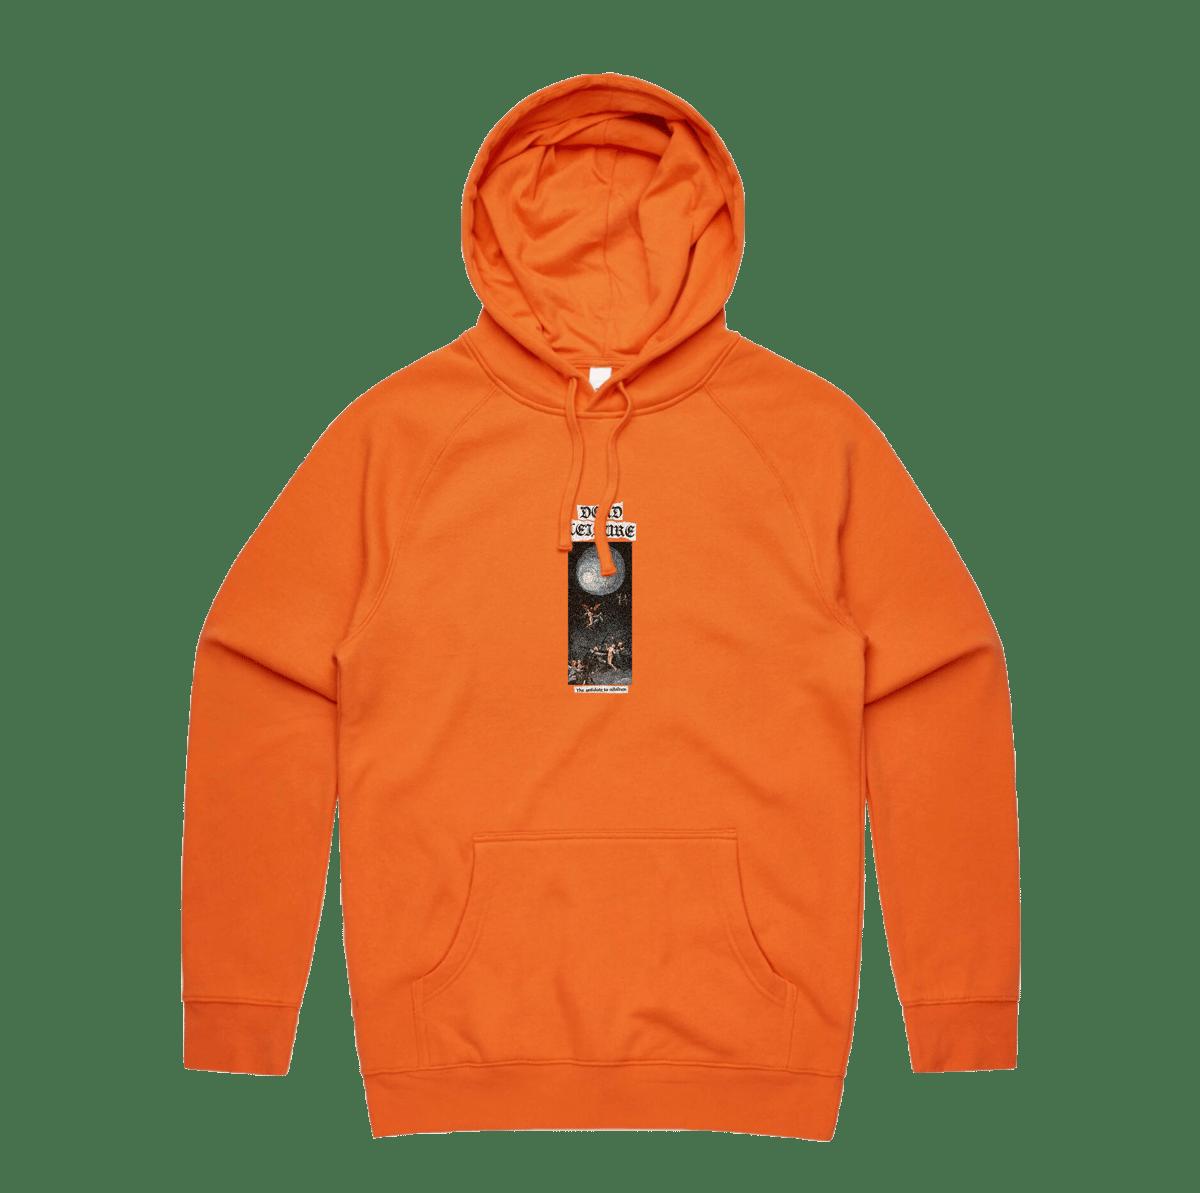 Antidote to Nihilism Hoodie - Orange